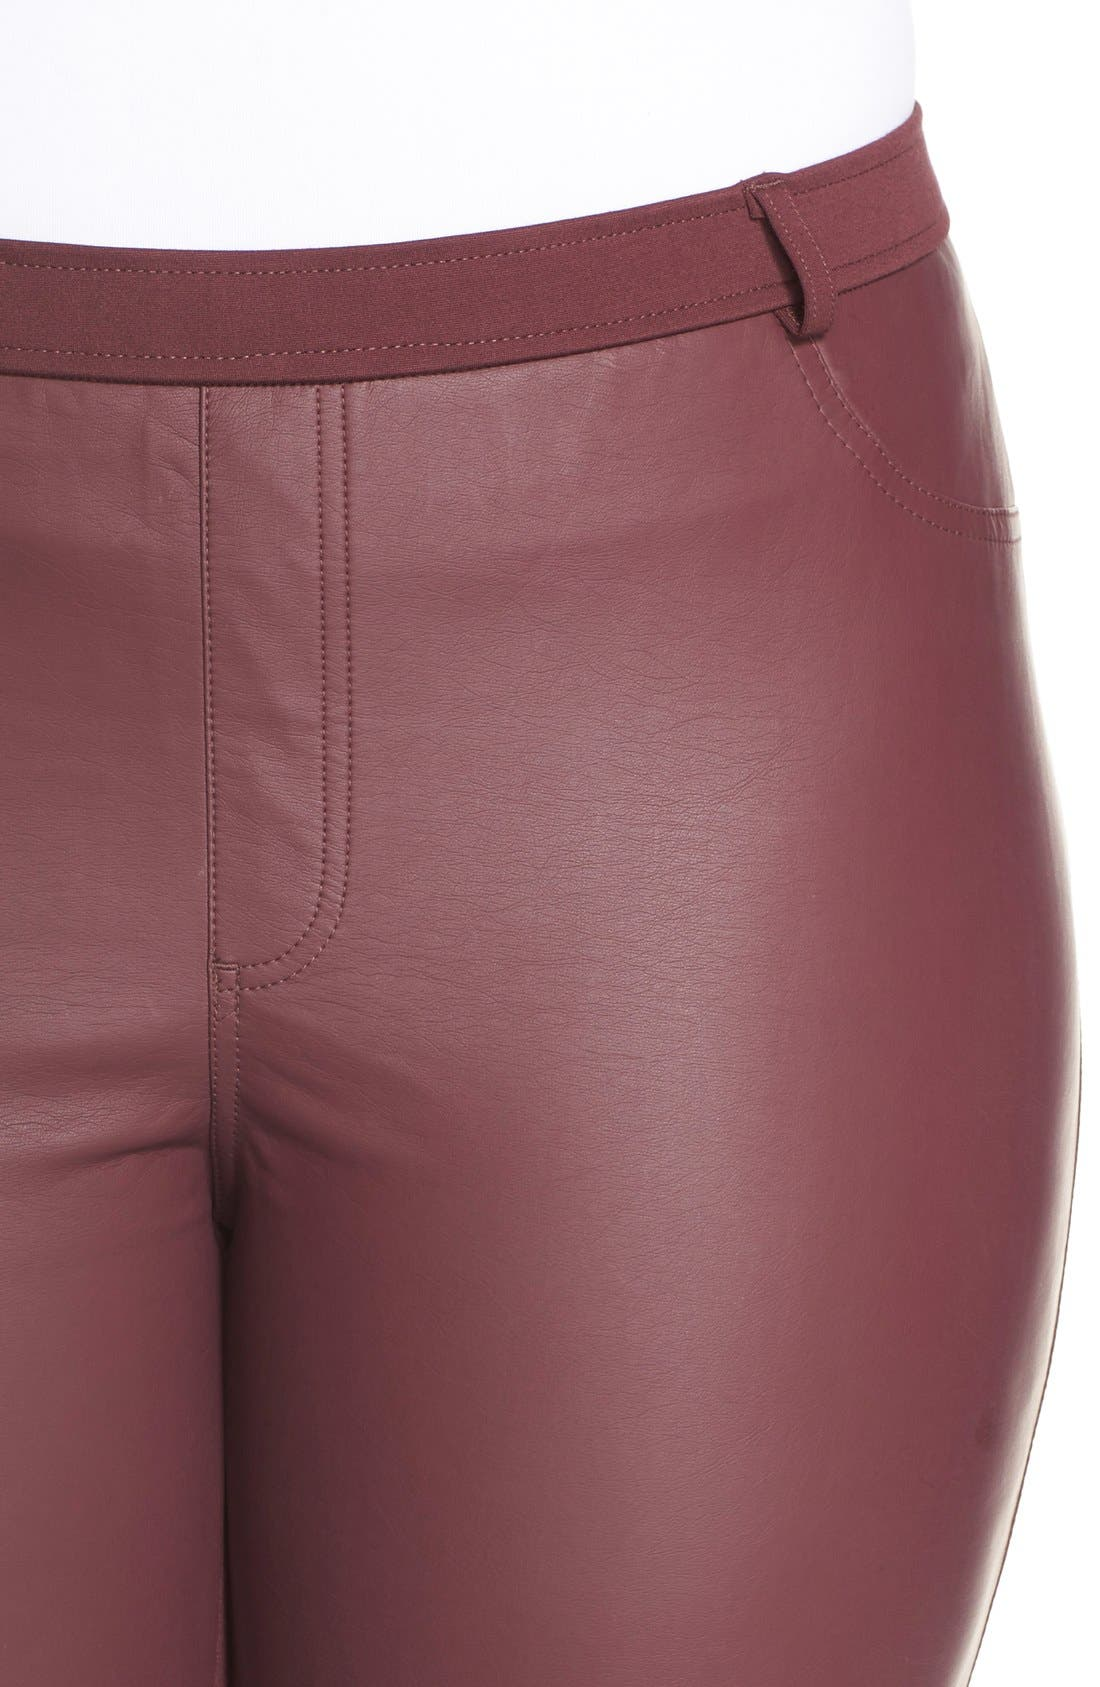 Alternate Image 4  - Tart 'Morgan' Faux Leather & Ponte Leggings (Plus Size)